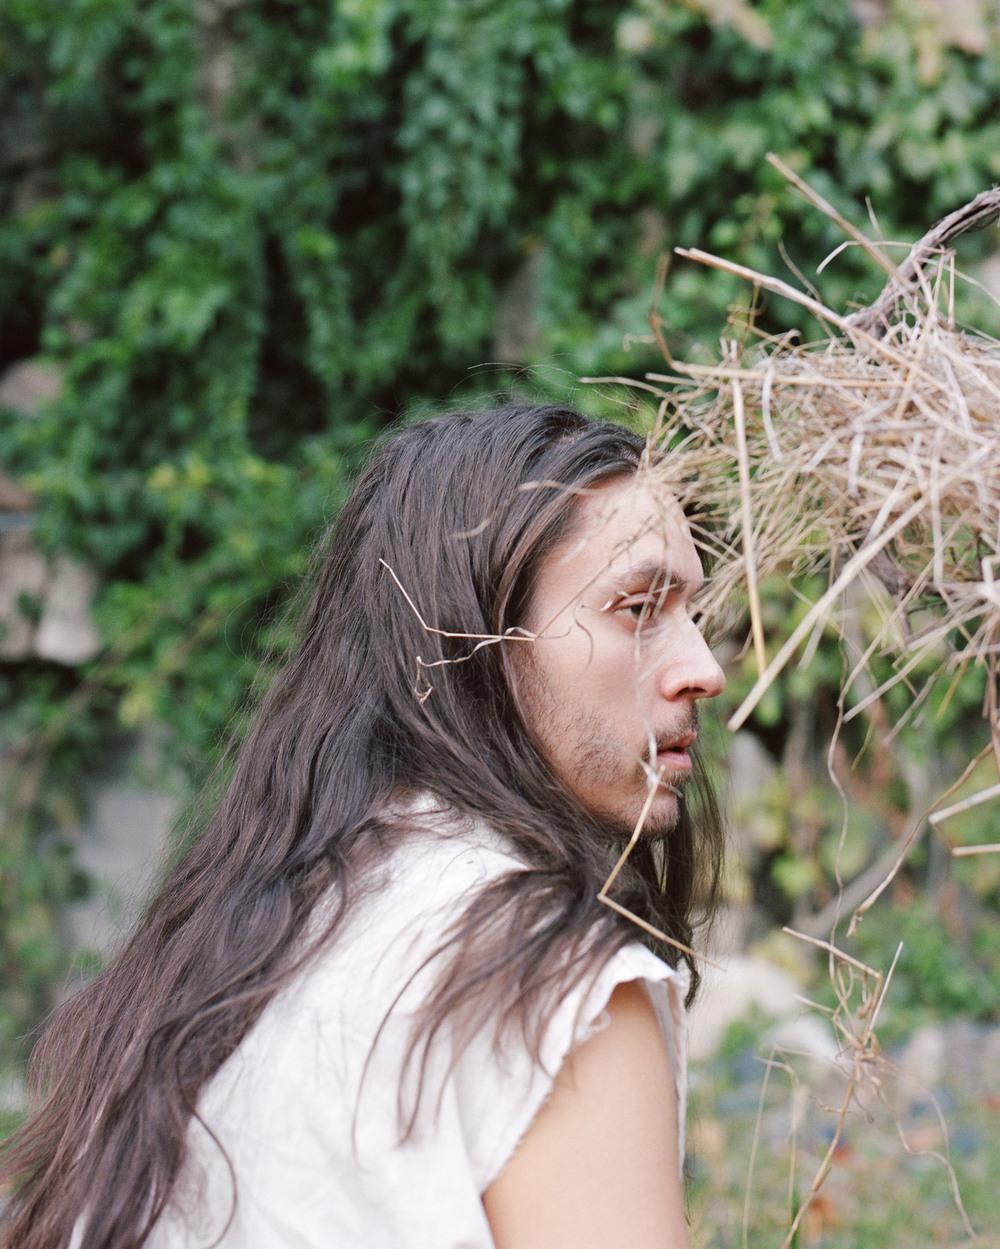 Christina-Arza-Taaron-Sundby.jpg